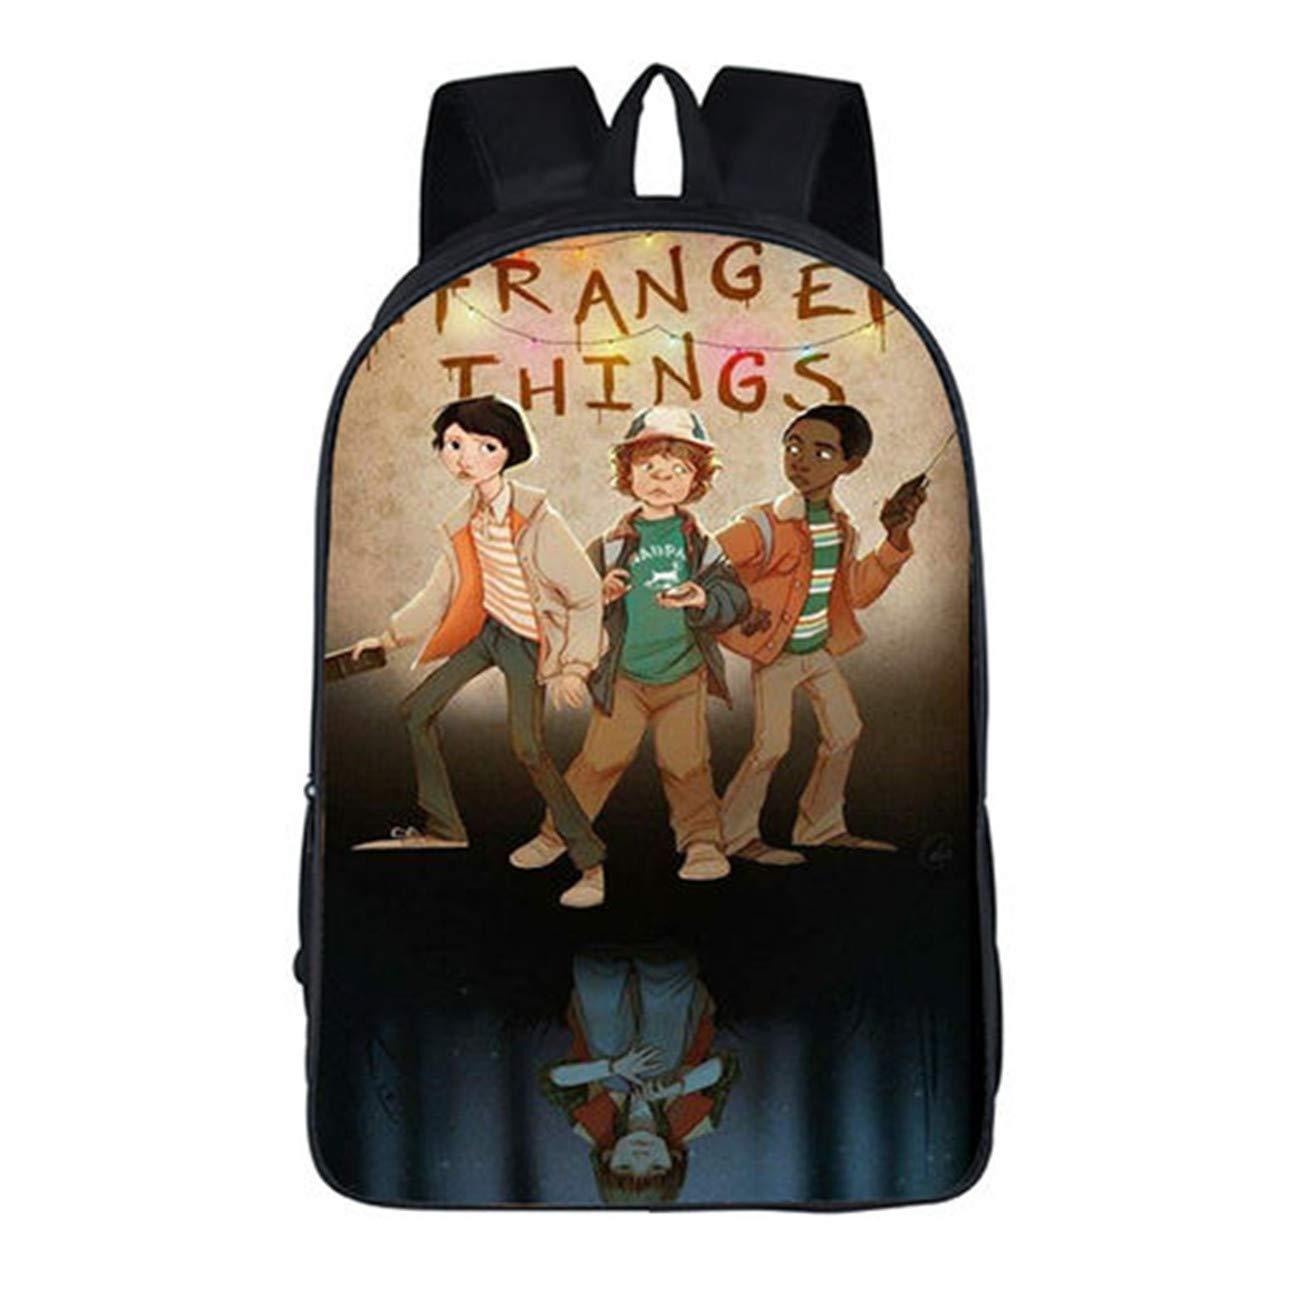 Mochila para fanáticos de Stranger Things Unisex Bolsa de ordenador portátil Bolsa de hombro Mochila de viaje escolar Bonito regalo para Stranger Things